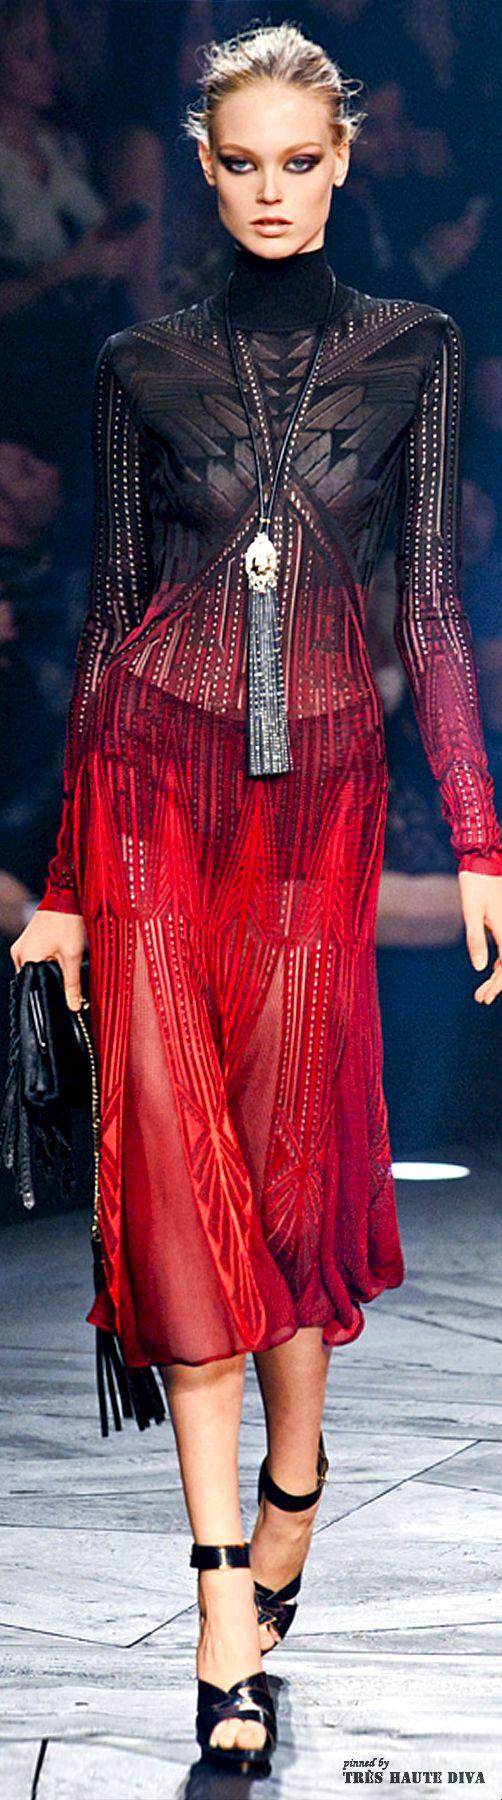 Milan Fashion Week Roberto #Cavalli Fall/Winter 2014 RTW - red and black dress